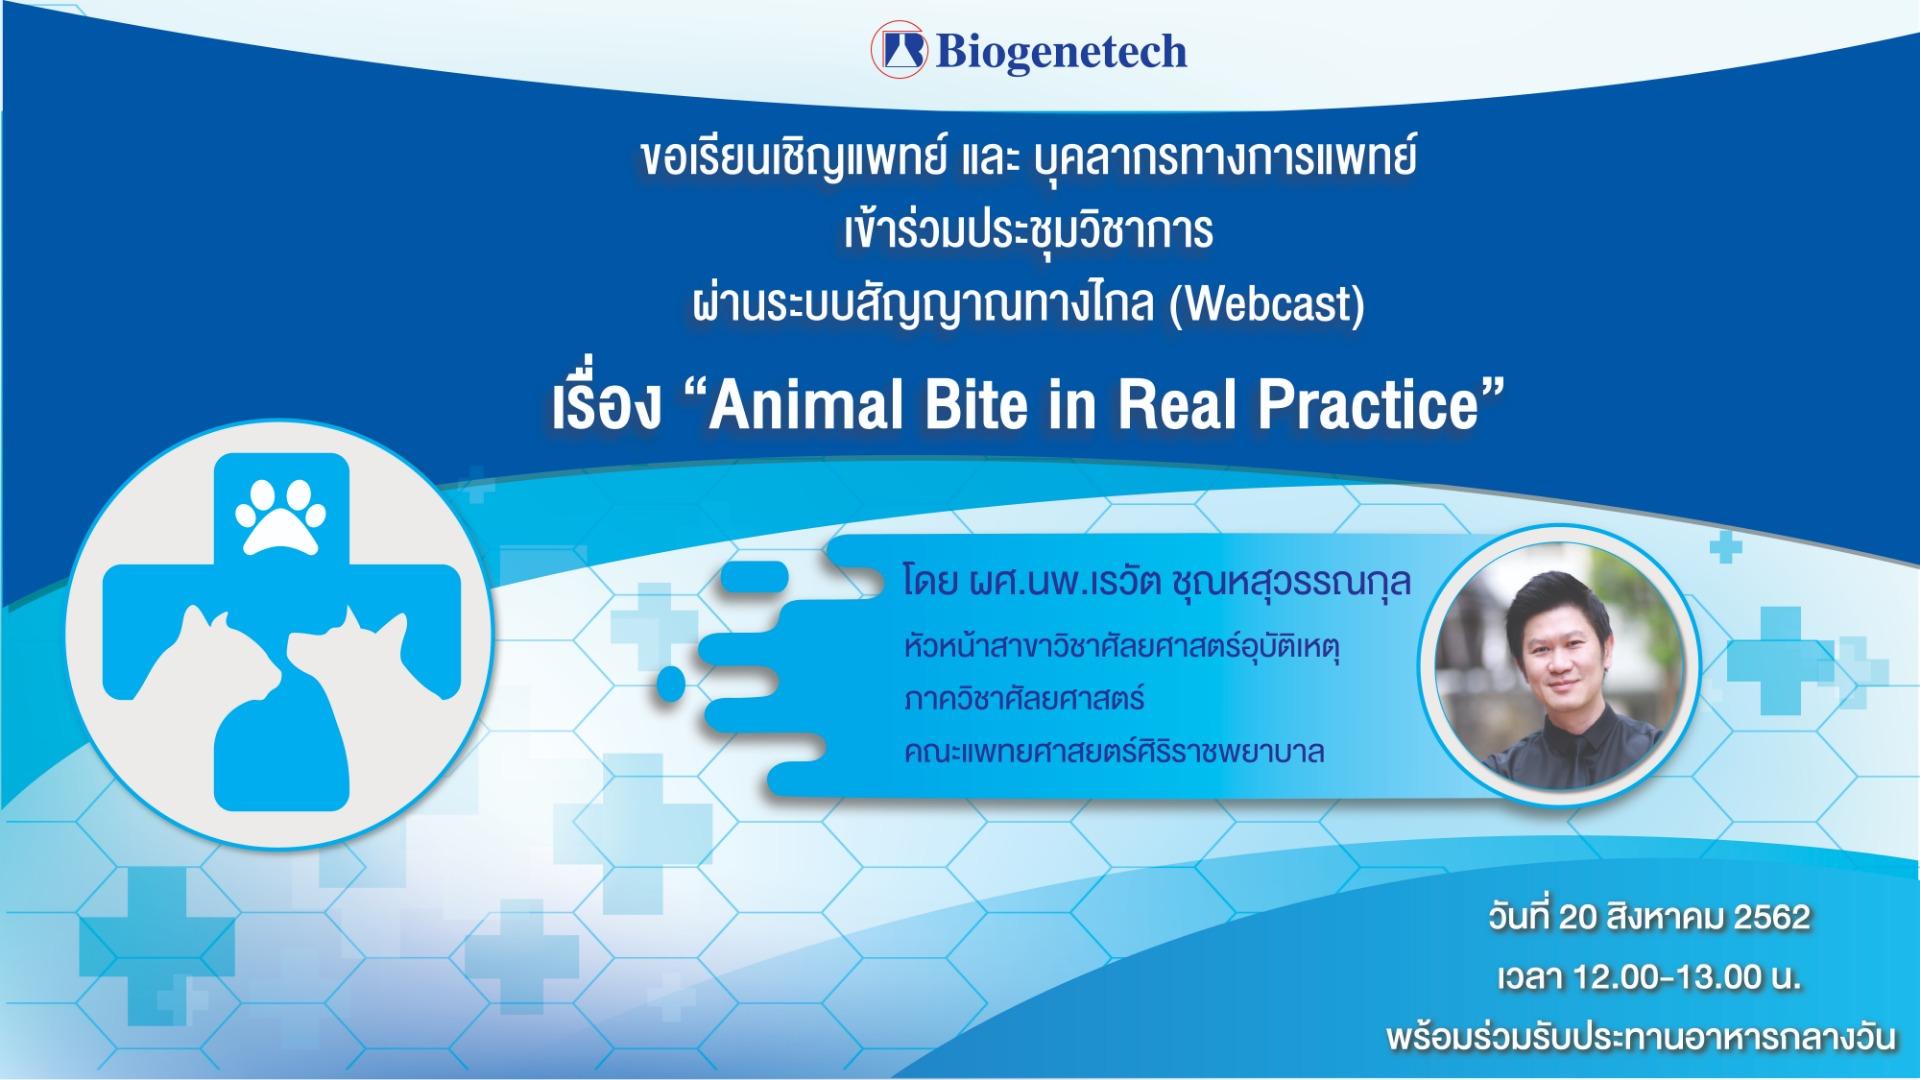 Biogenetech | Animal Bite in Real Practice